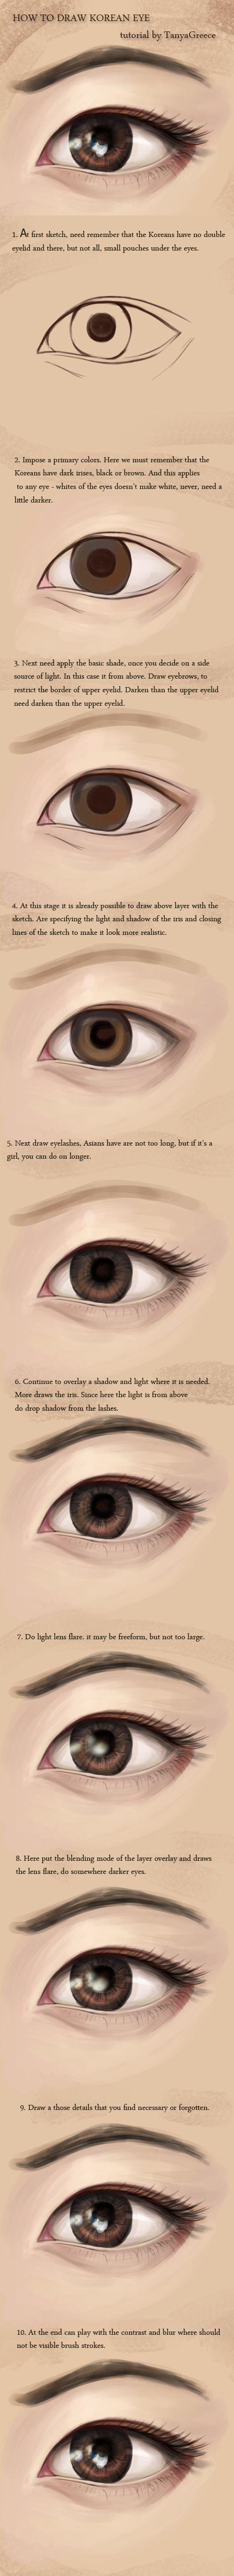 How To Draw Korean Eye by TanyaGreece on deviantART